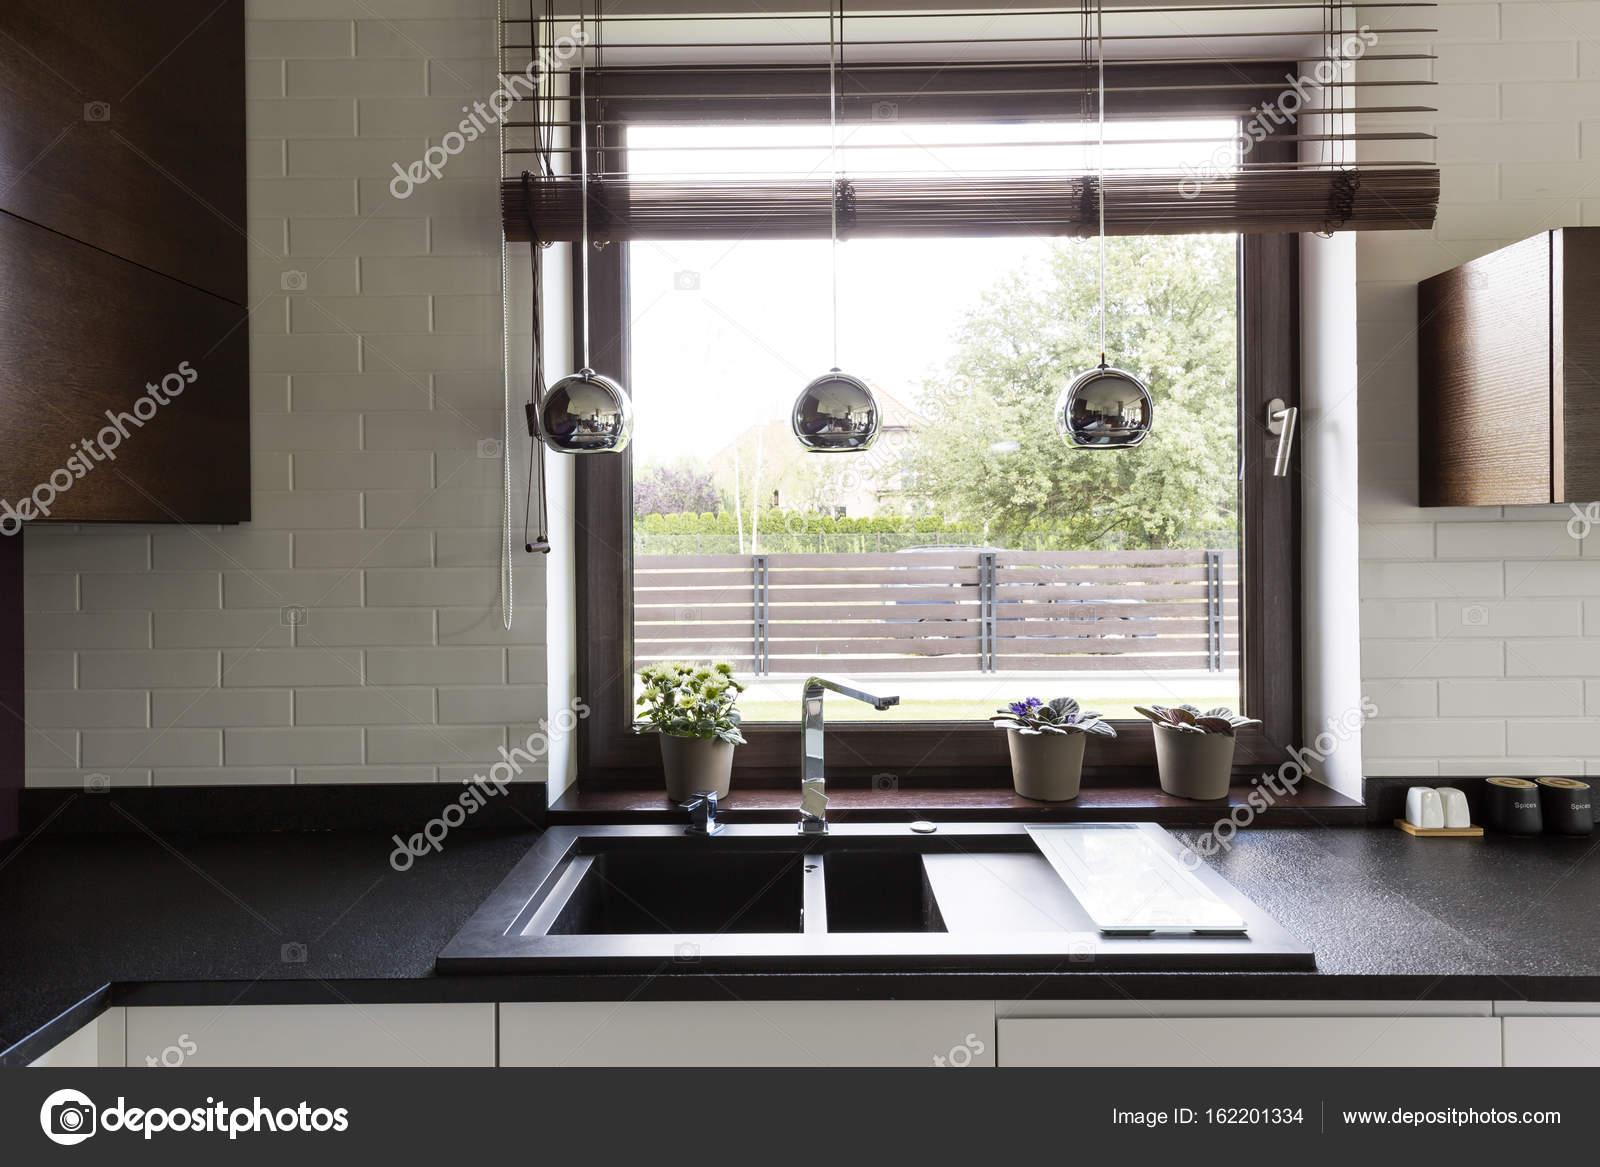 Dunkle Arbeitsplatte Mit Elegante Kuche Stockfoto C Photographee